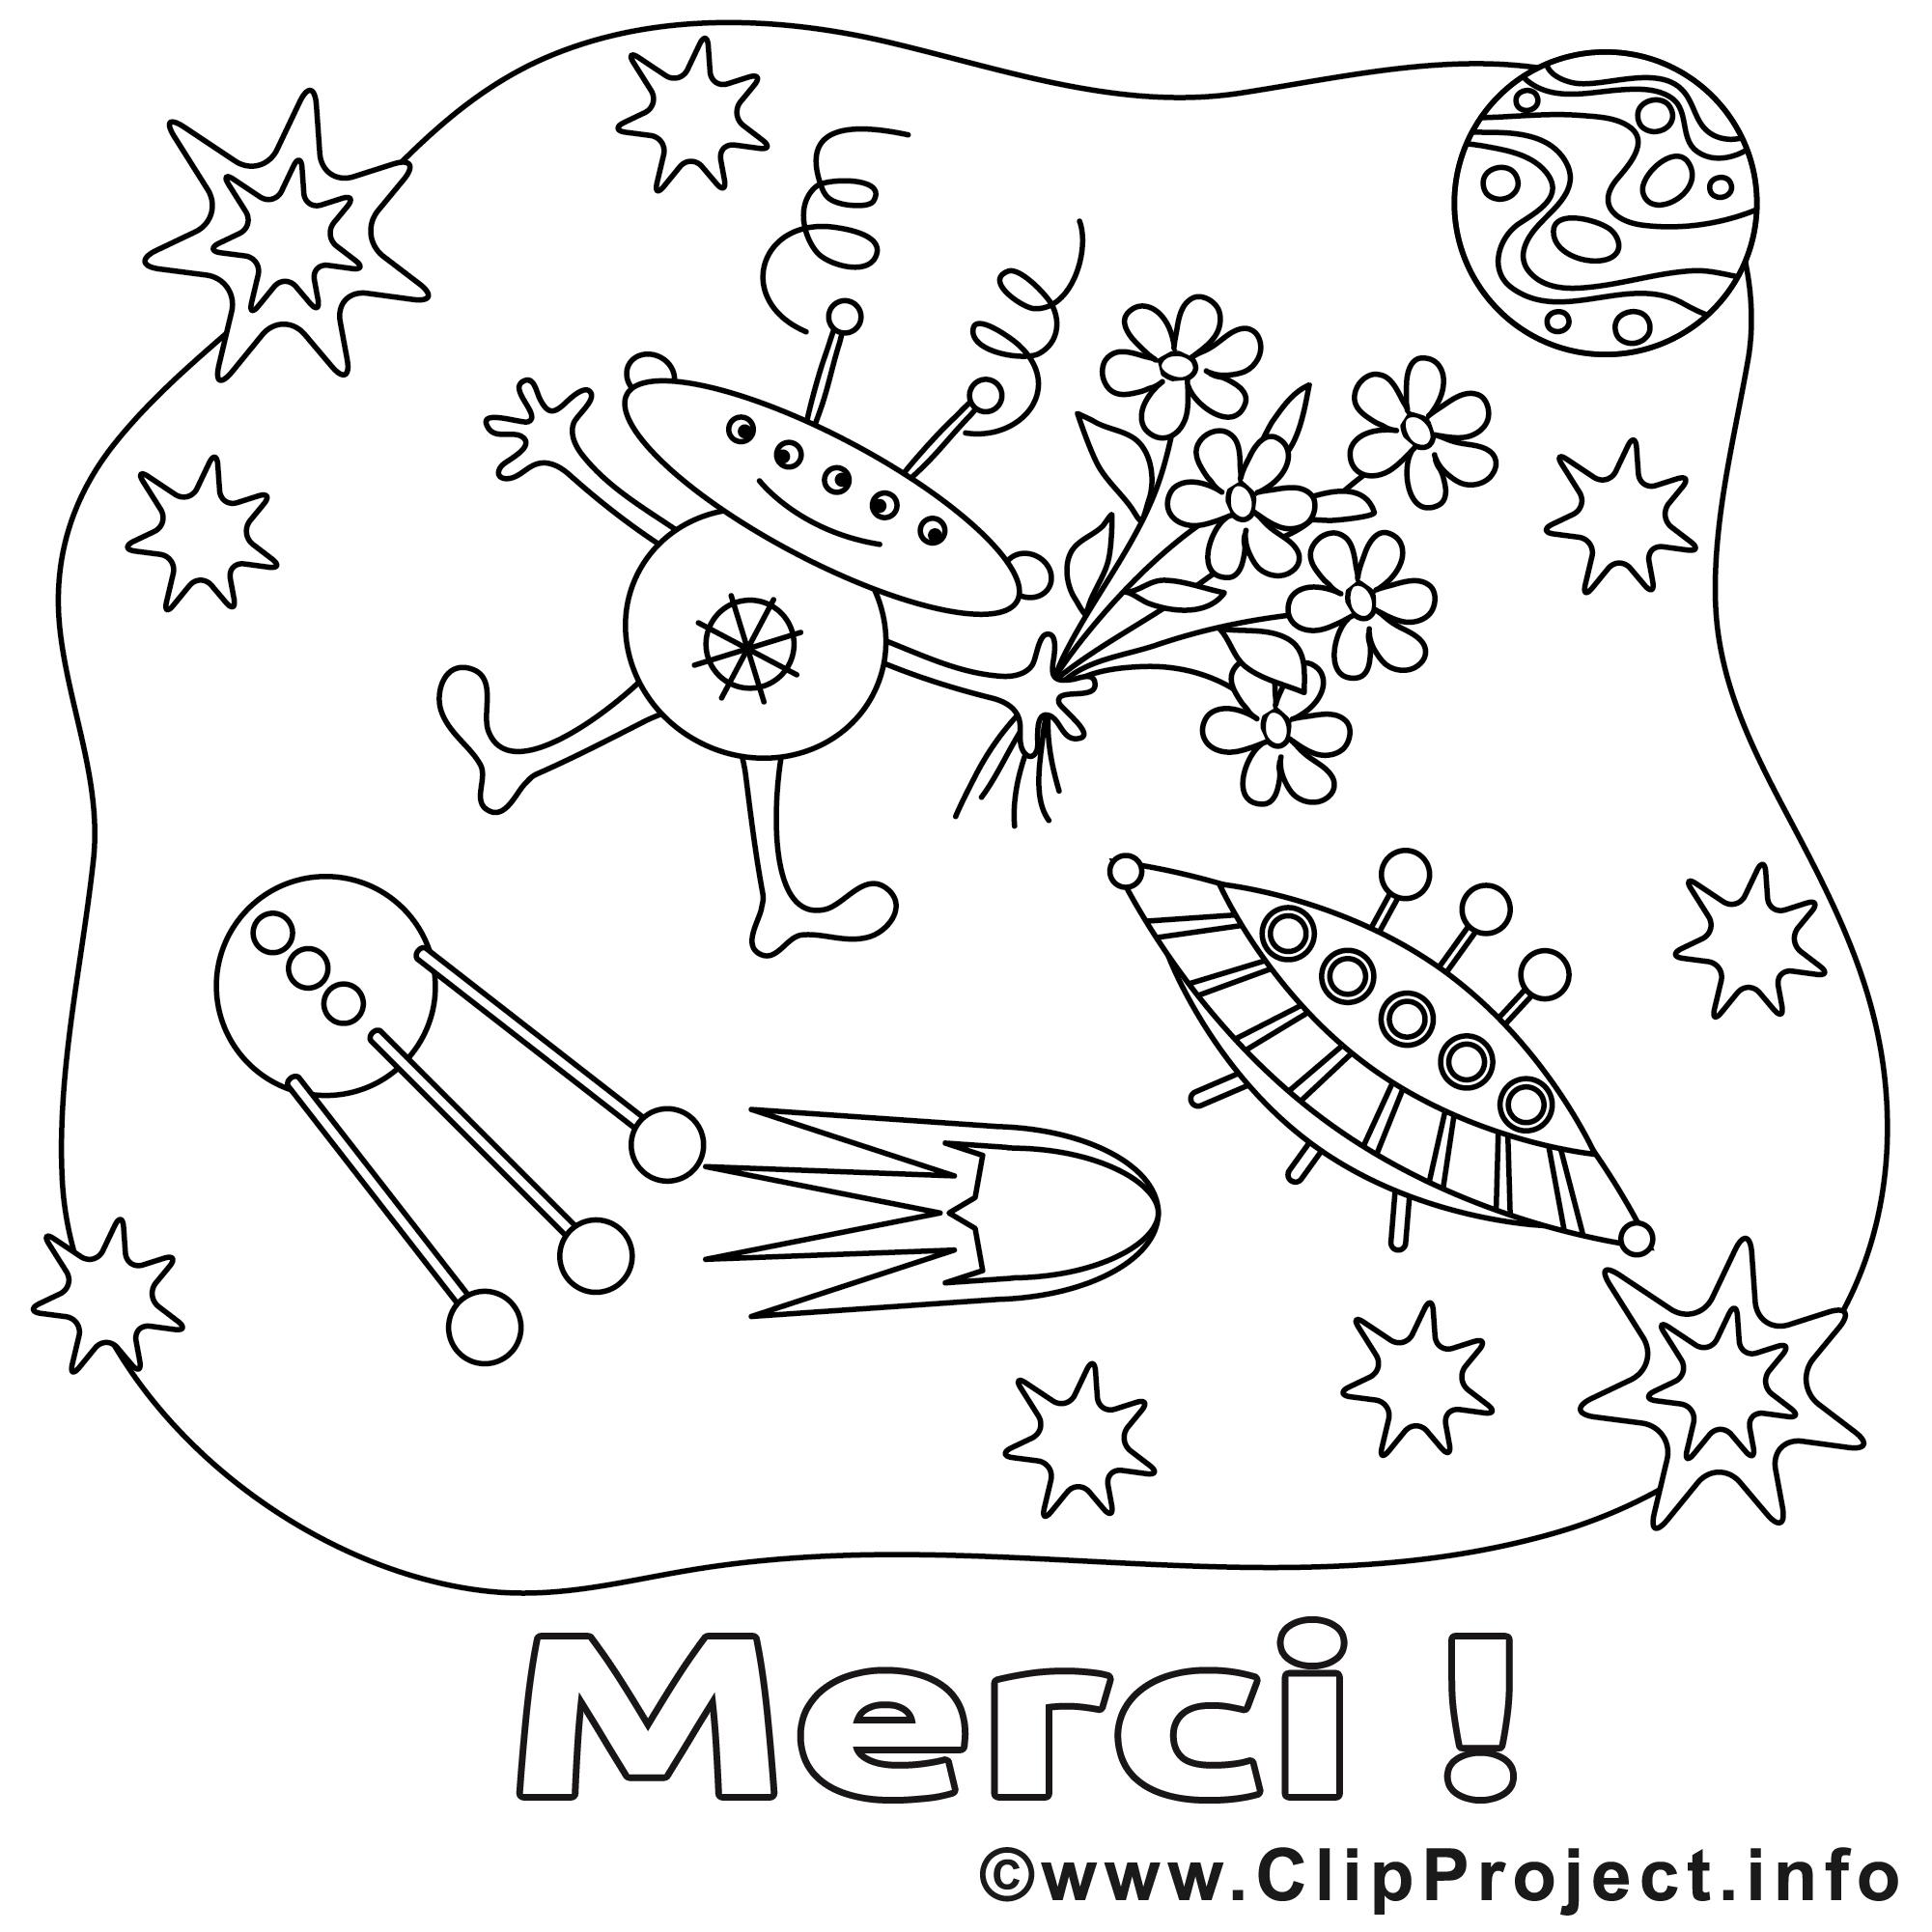 Extraterrestre dessin gratuit merci colorier merci - Coloriage extraterrestre ...